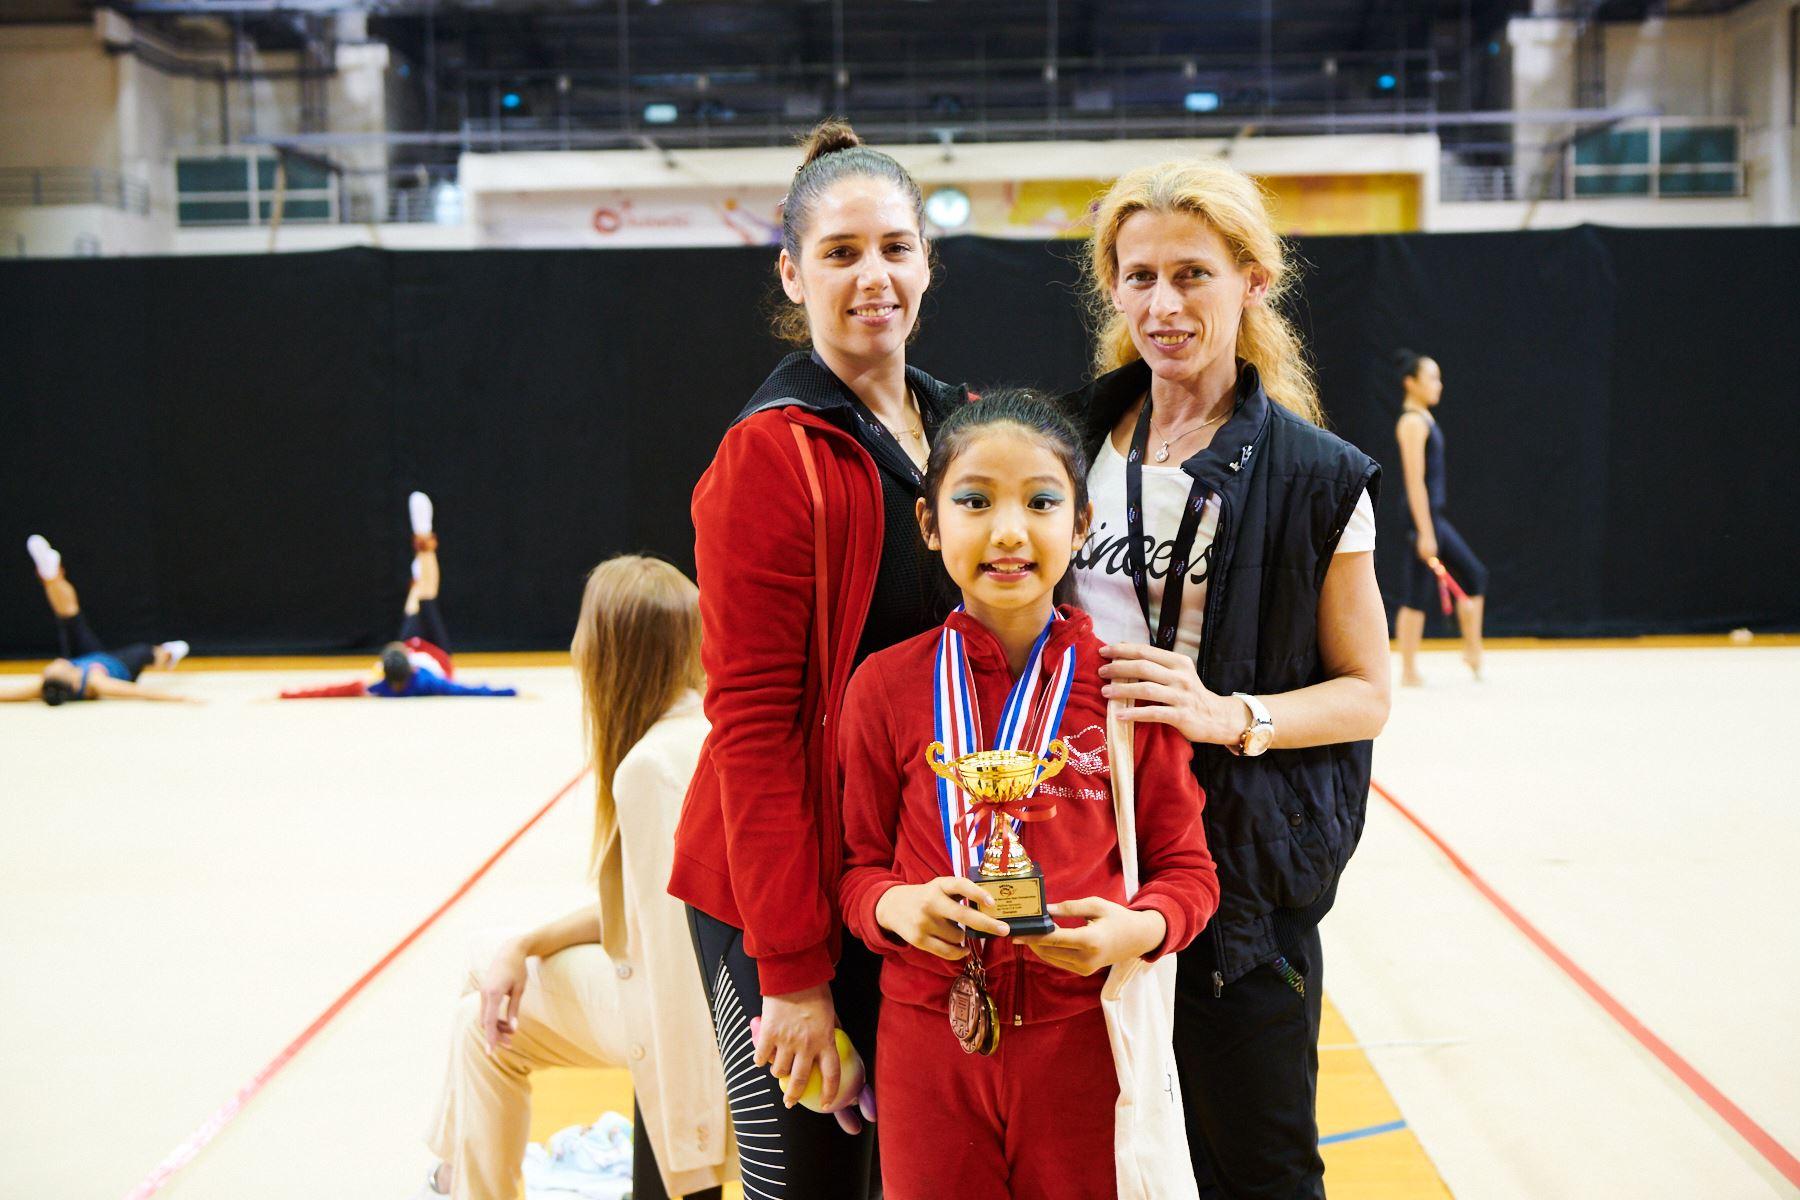 Singapore Gymnastics Open Championships 2018 13